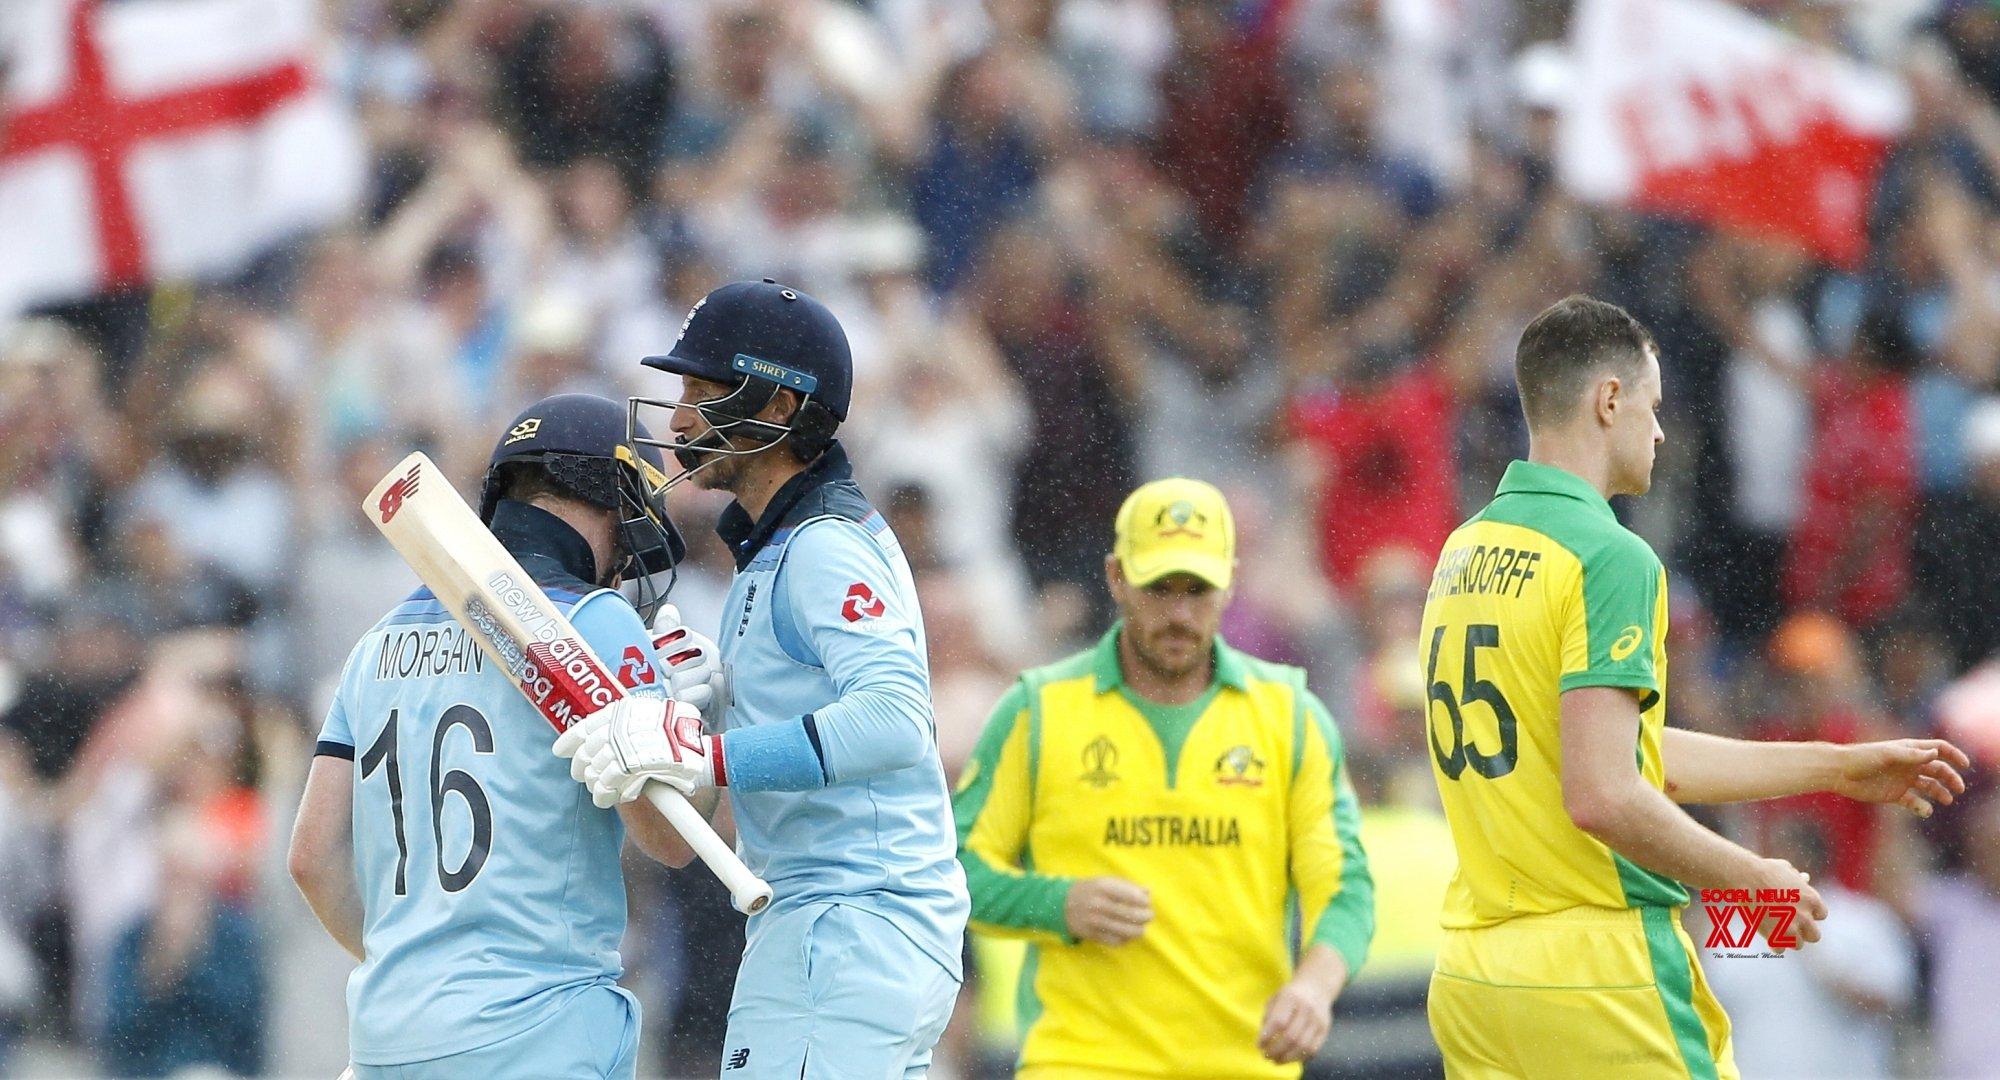 Birmingham (England): 2019 World Cup - 2nd Semi - final - Australia Vs England (Batch - 47) #Gallery